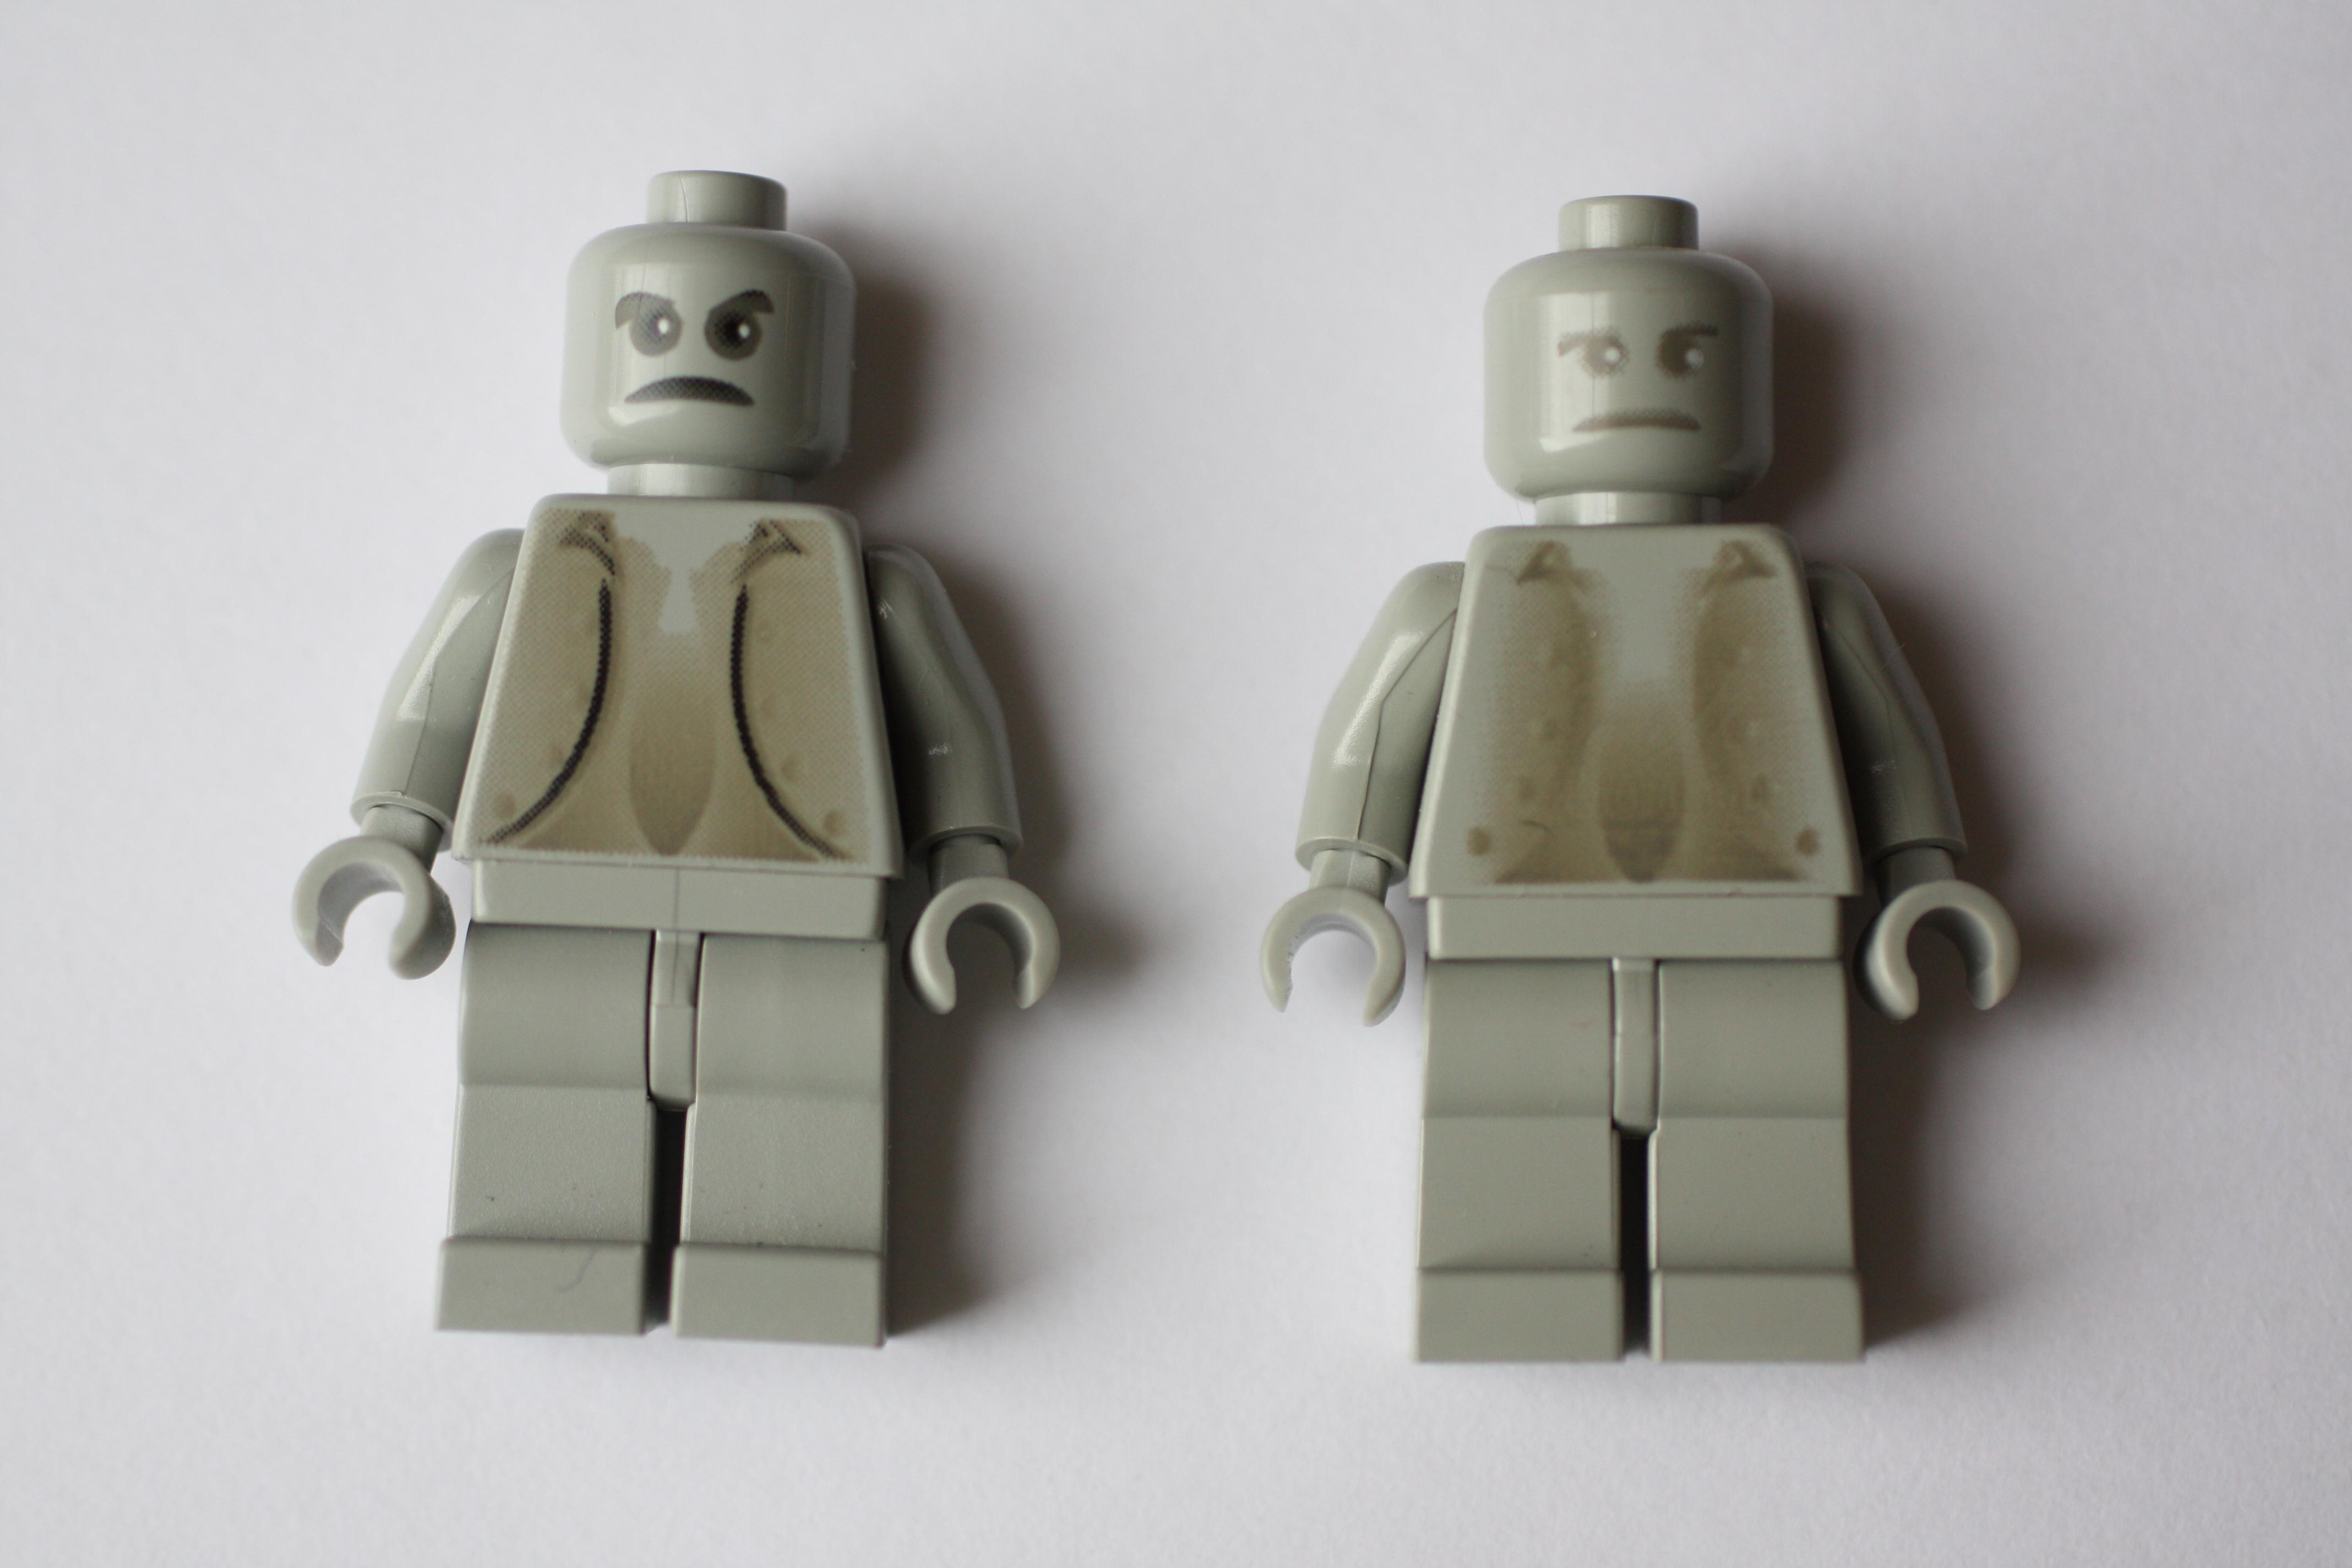 harry potter peeves printing error u2014 brickset forum